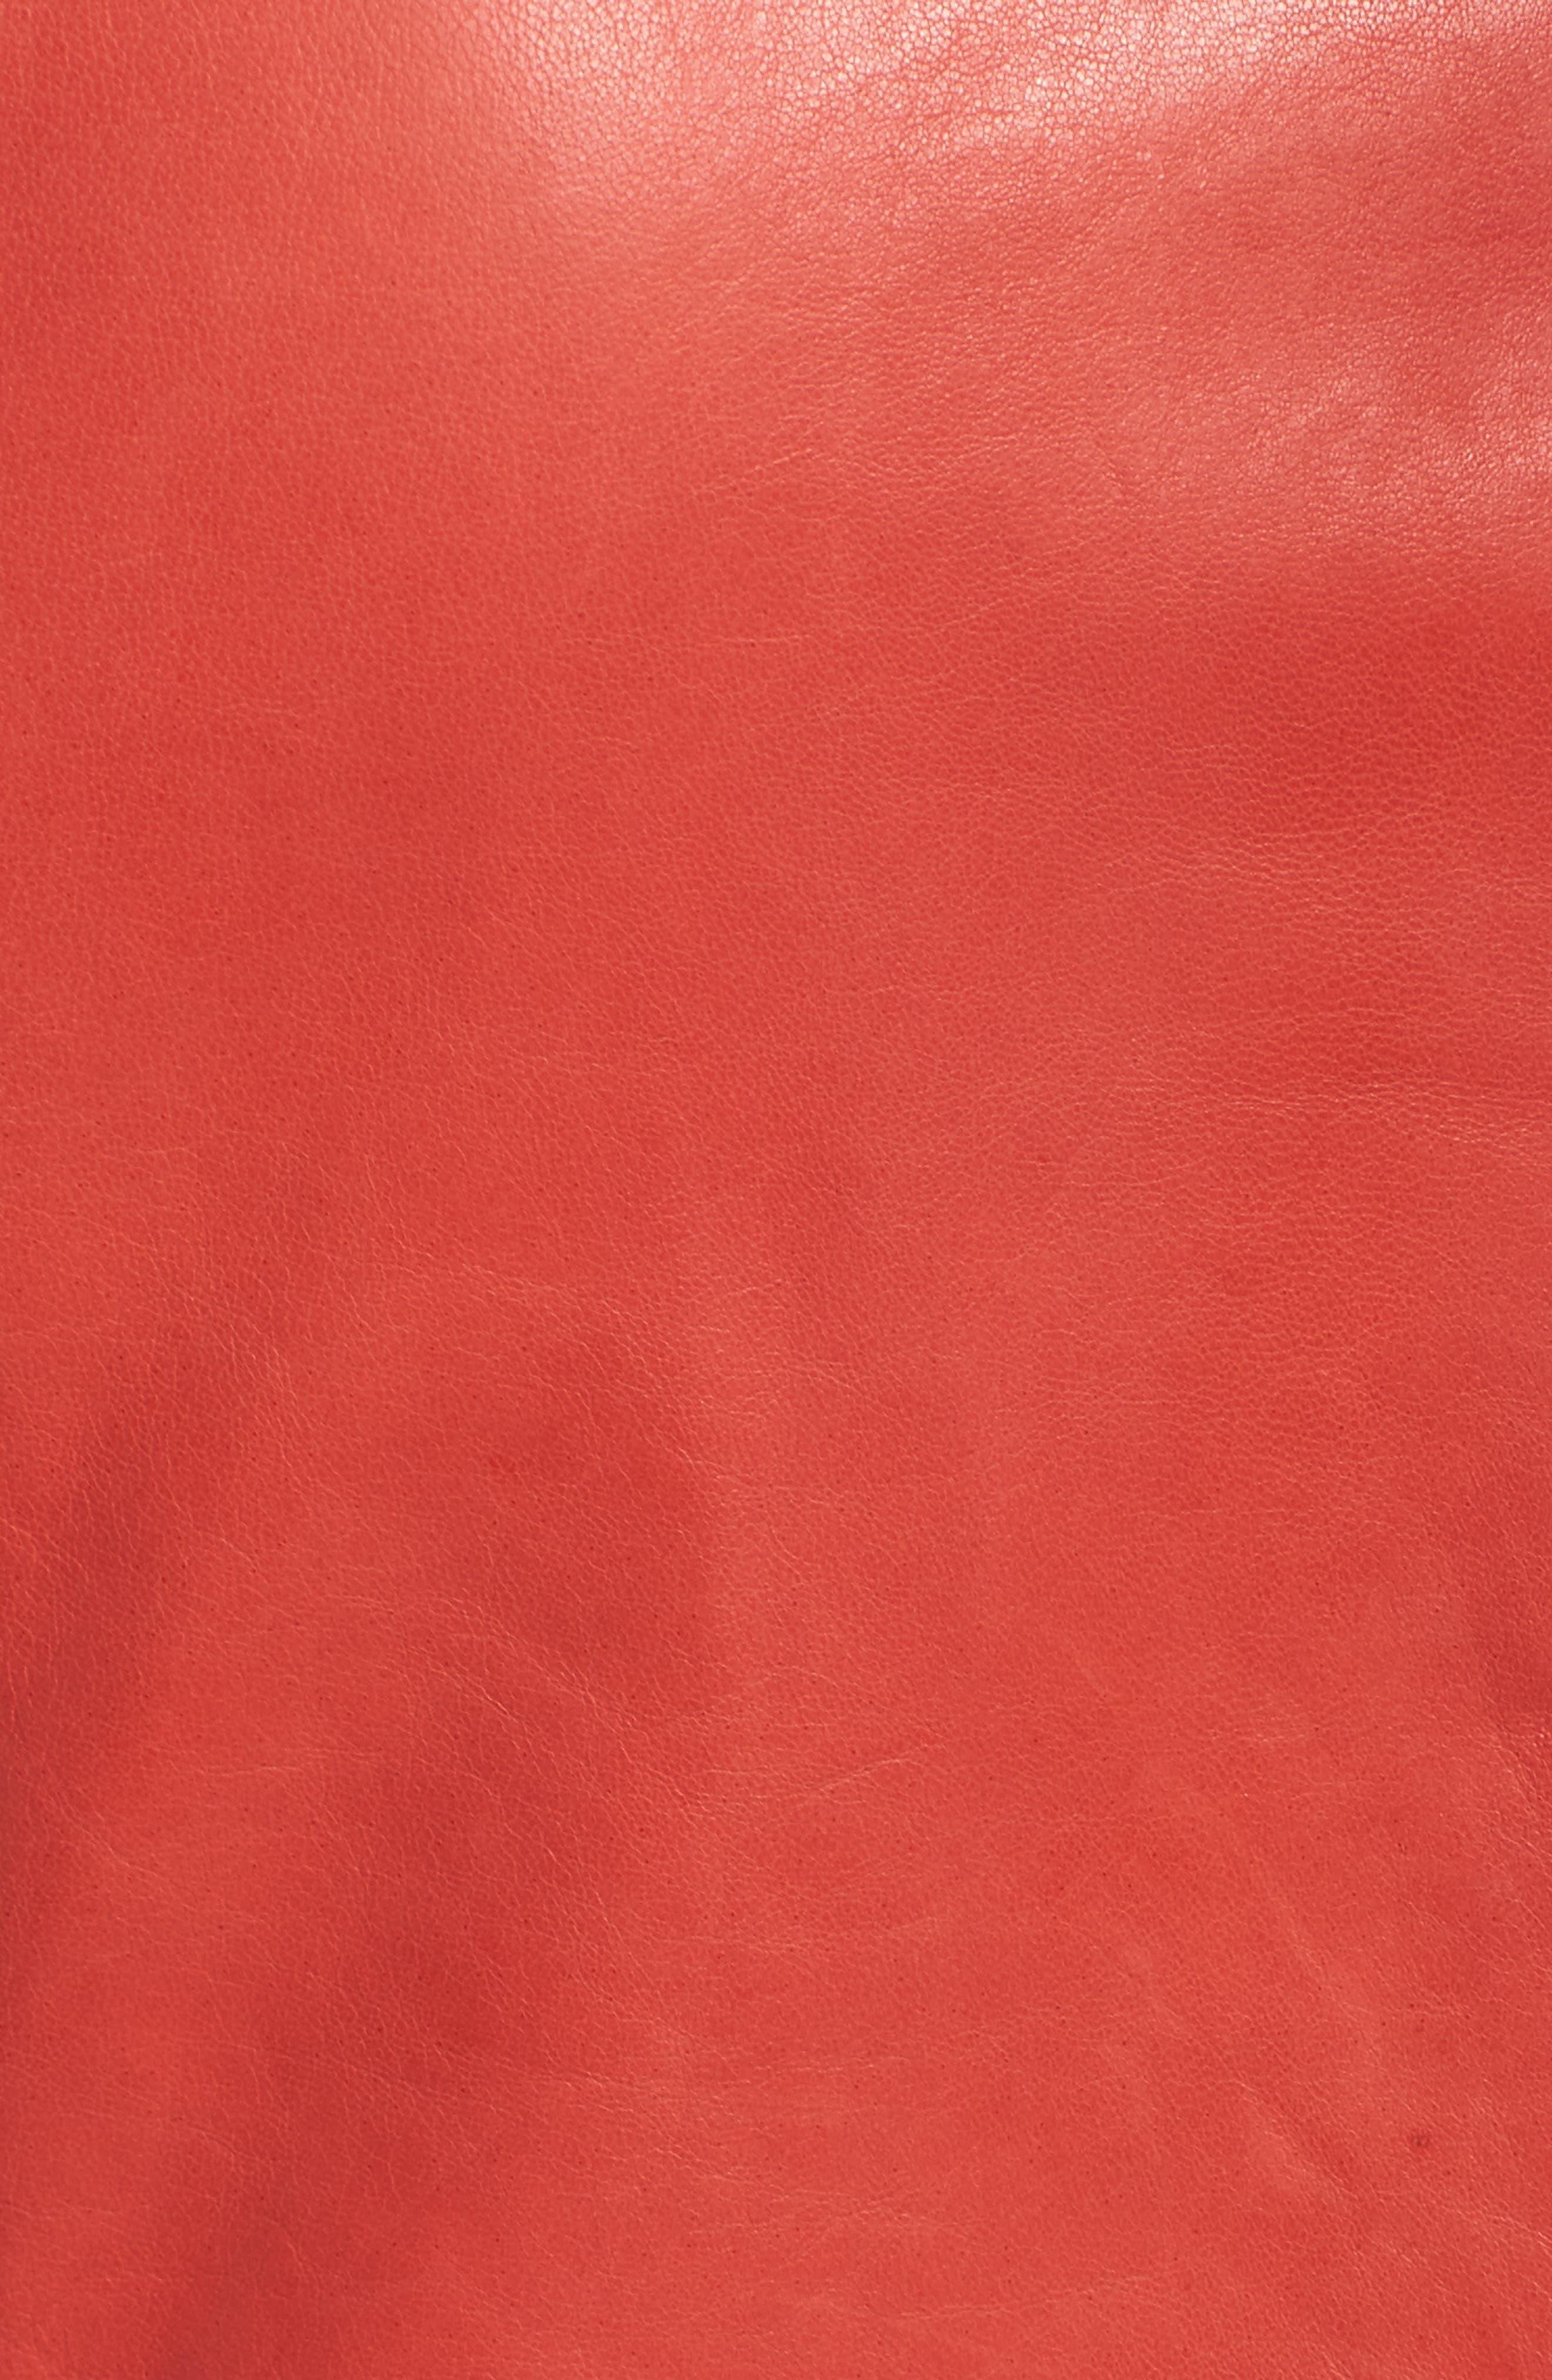 Caridee Glazed Lambskin Leather Jacket,                             Alternate thumbnail 6, color,                             604